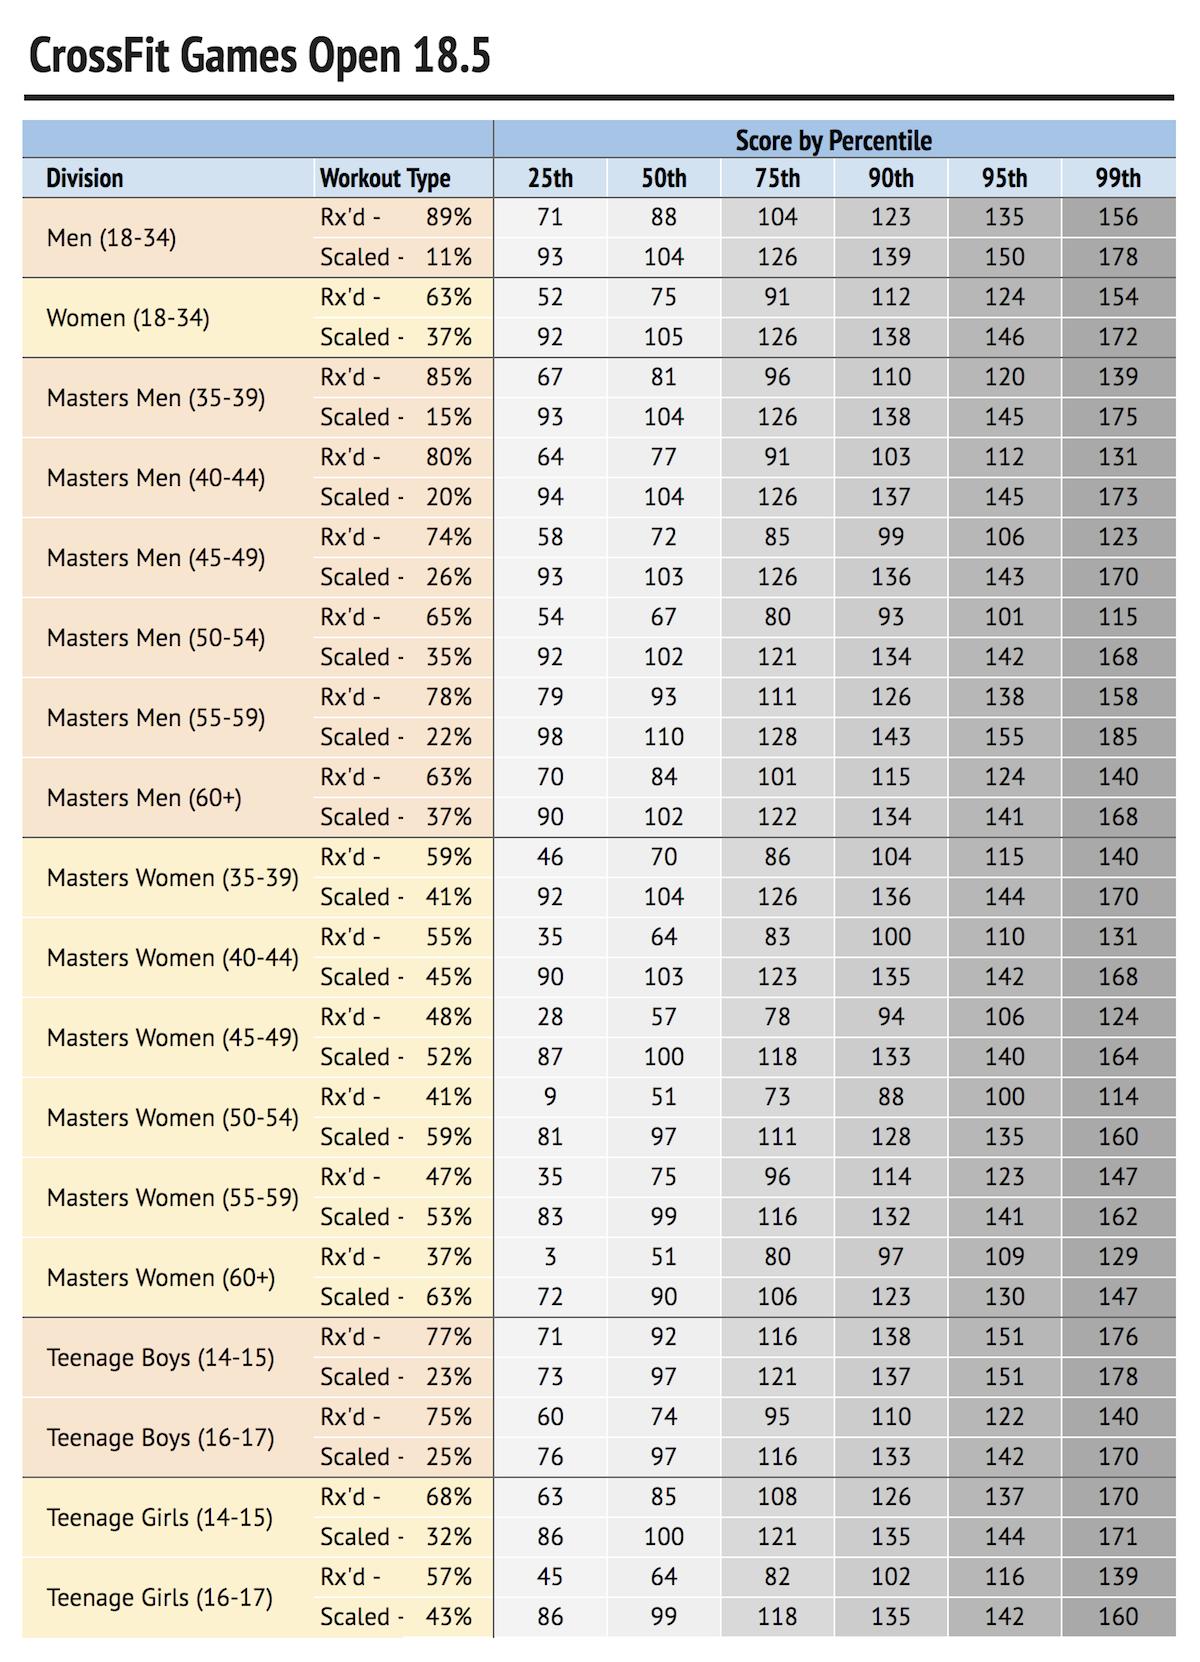 18.5 percentiles chart